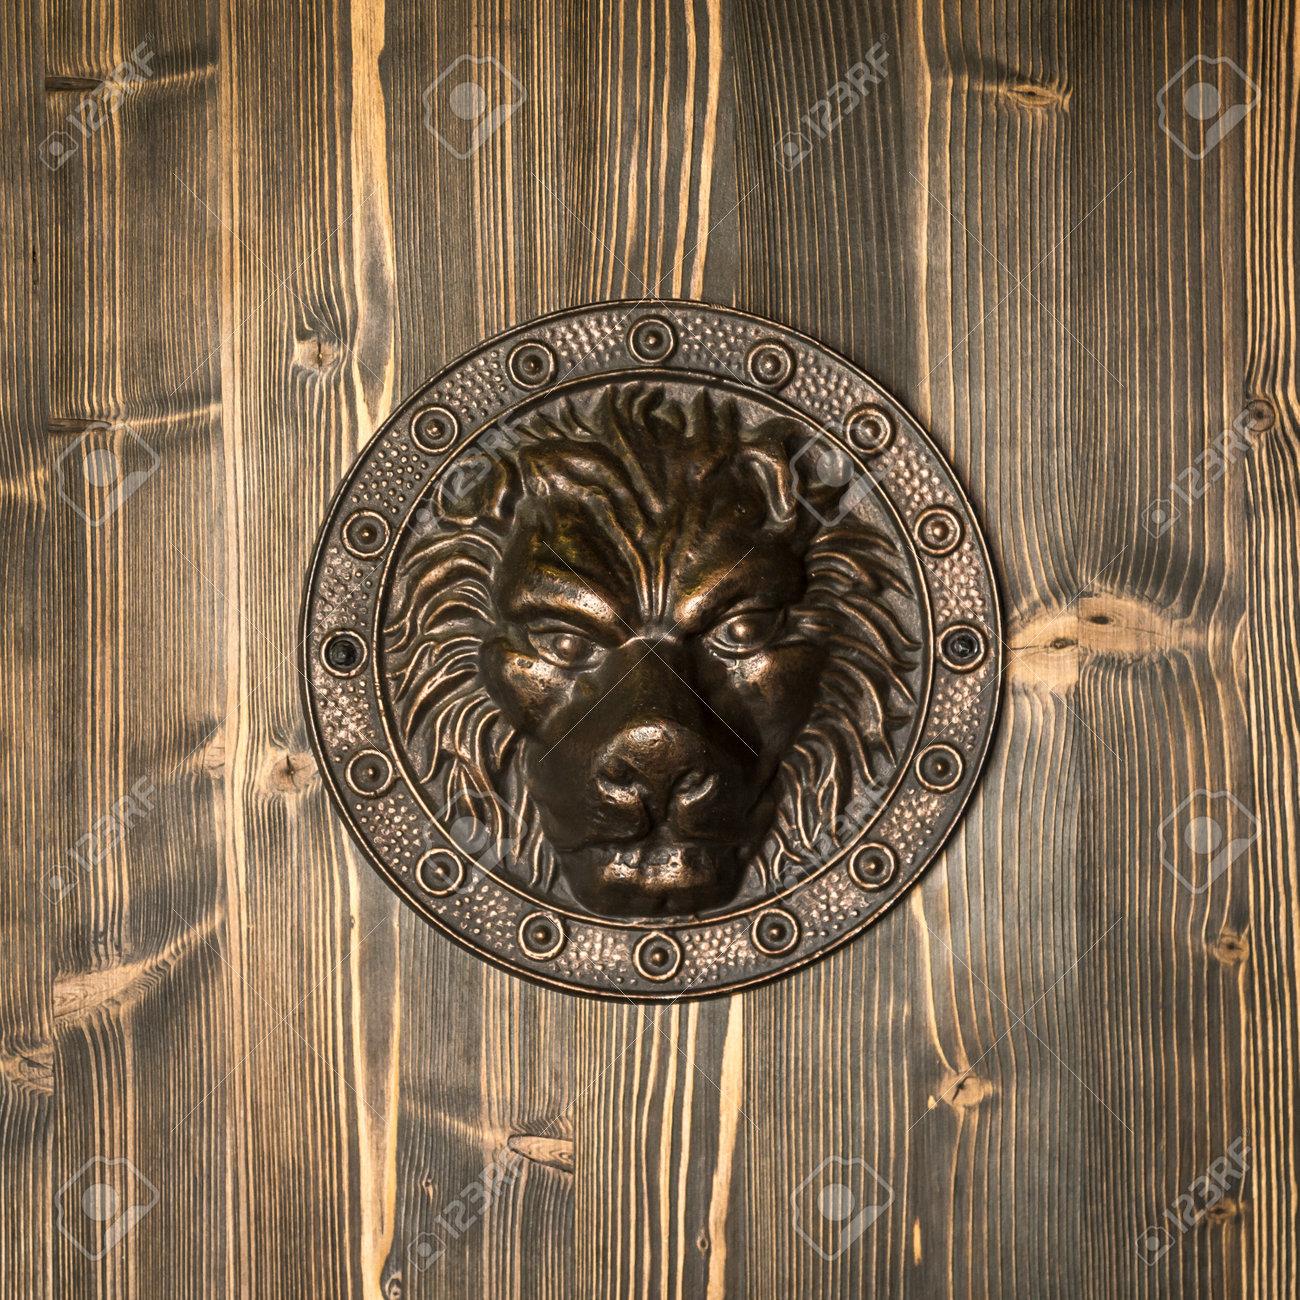 Vintage Brass Door Knocker Lion Head Decorative Detail On